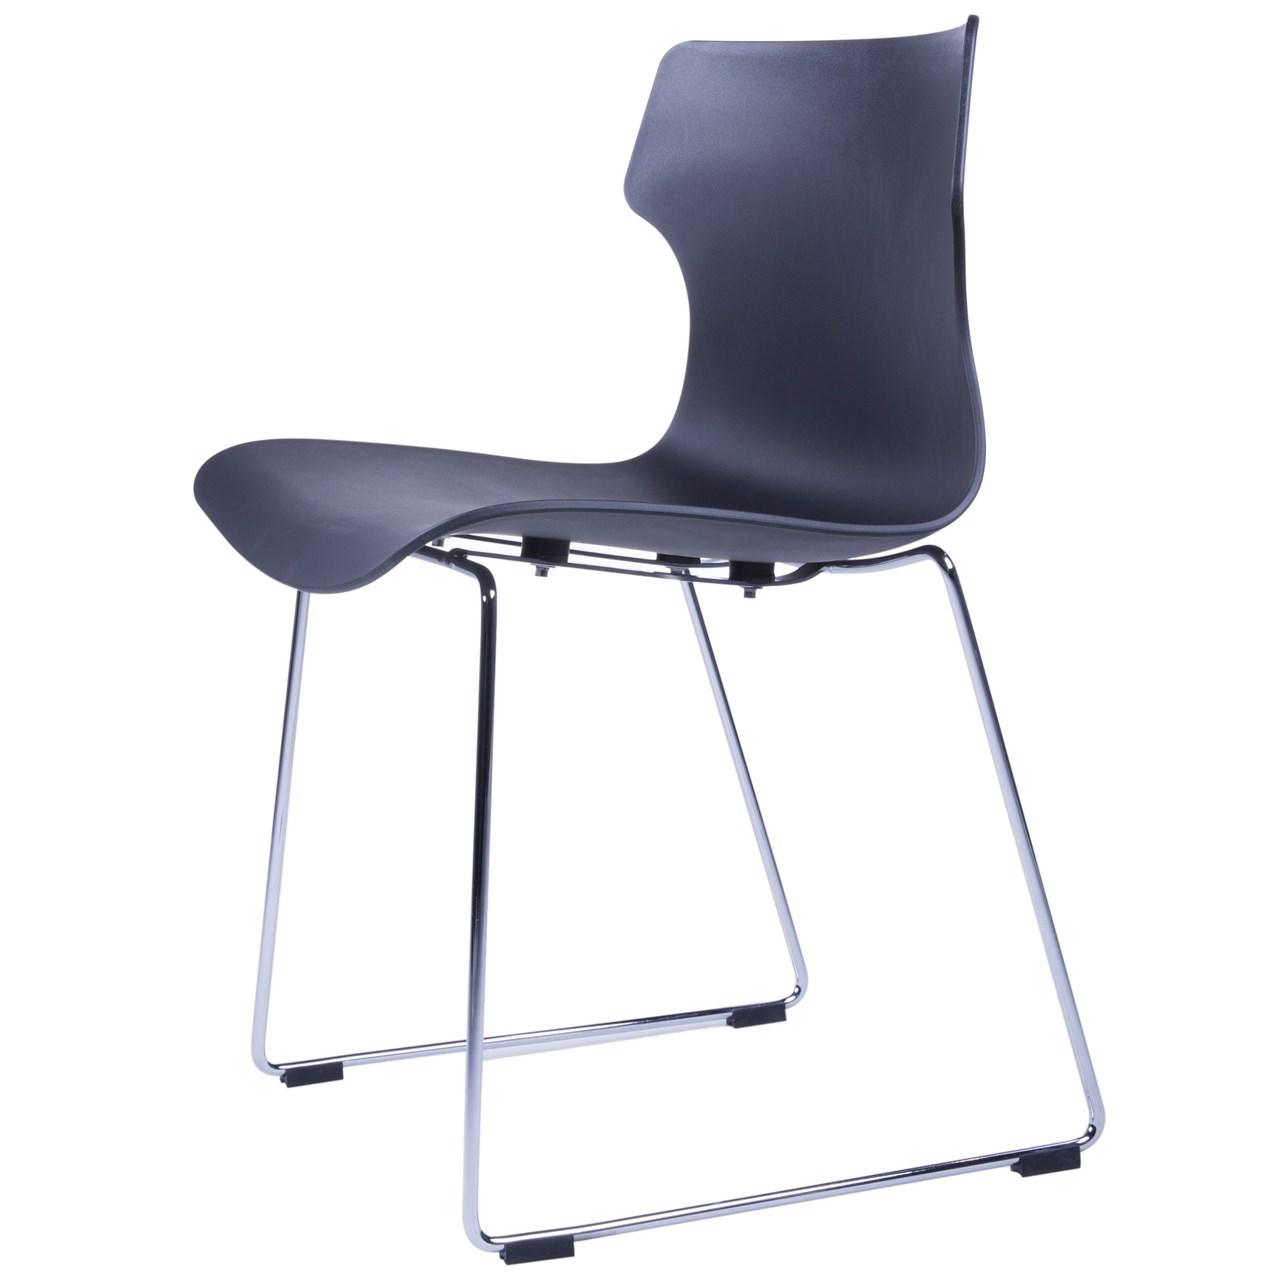 صندلی کروماتیک مدل Black Side Chair Steel Legs